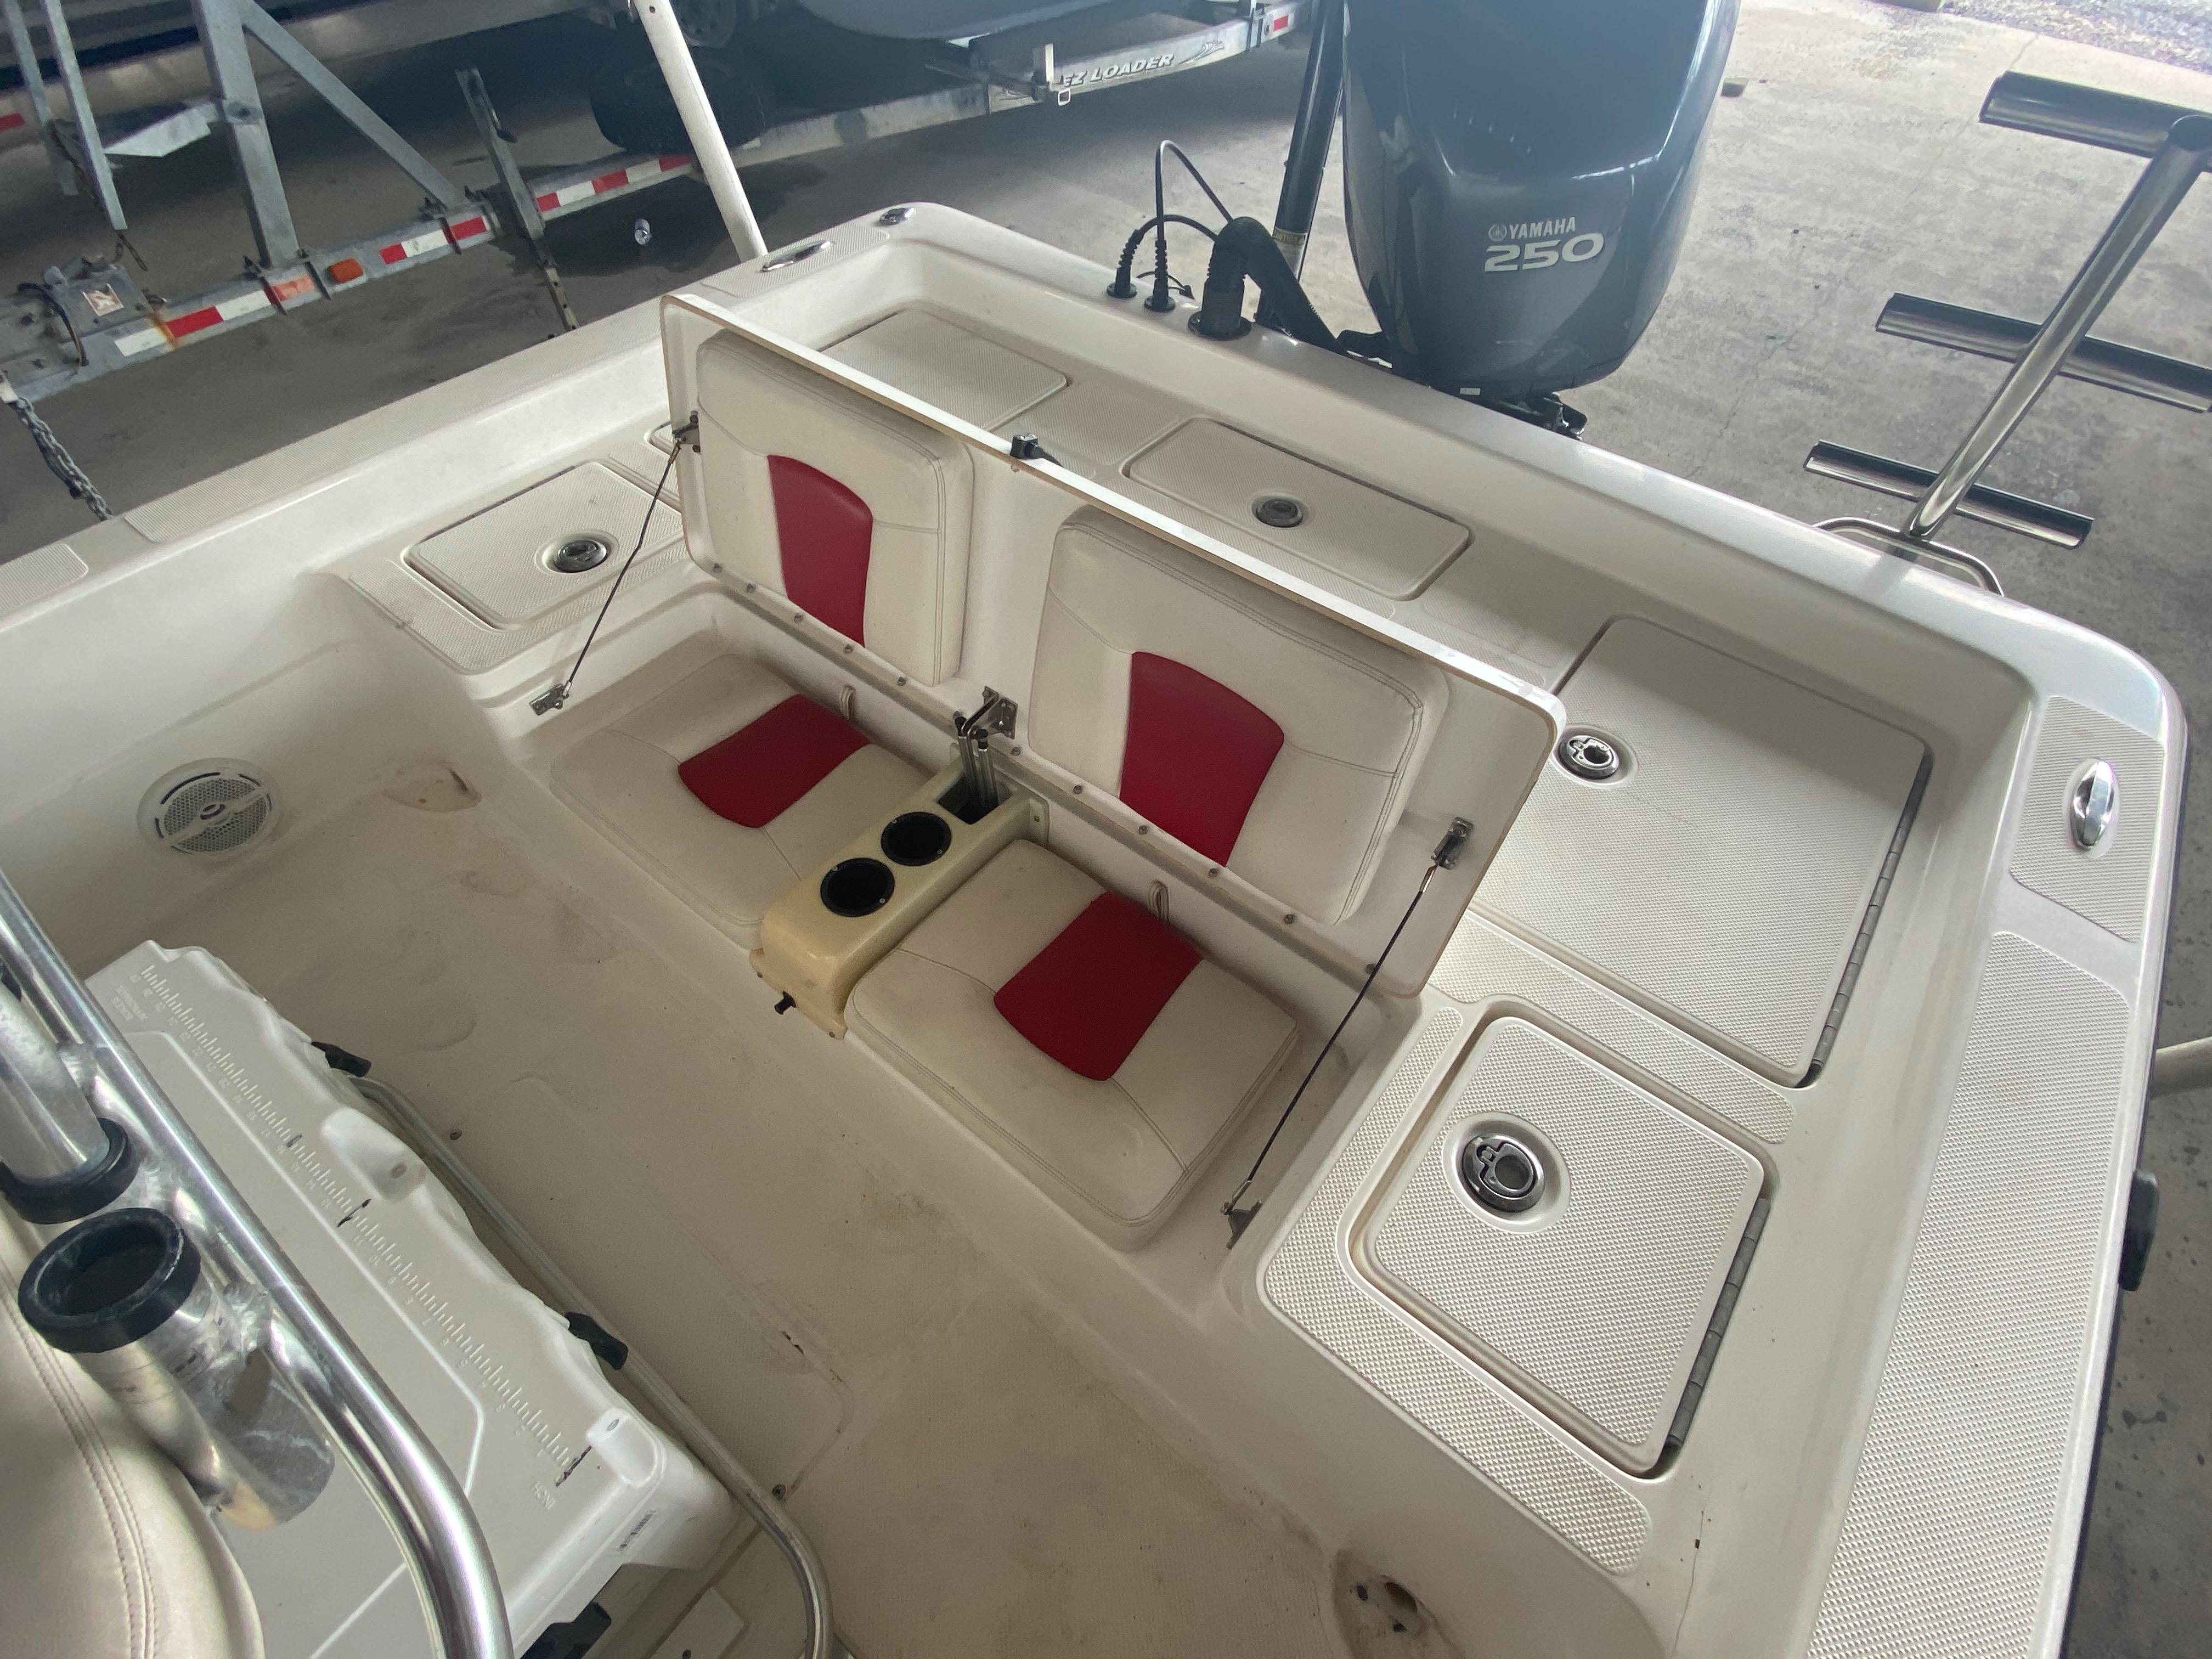 2010 Skeeter boat for sale, model of the boat is ZX24V & Image # 6 of 16